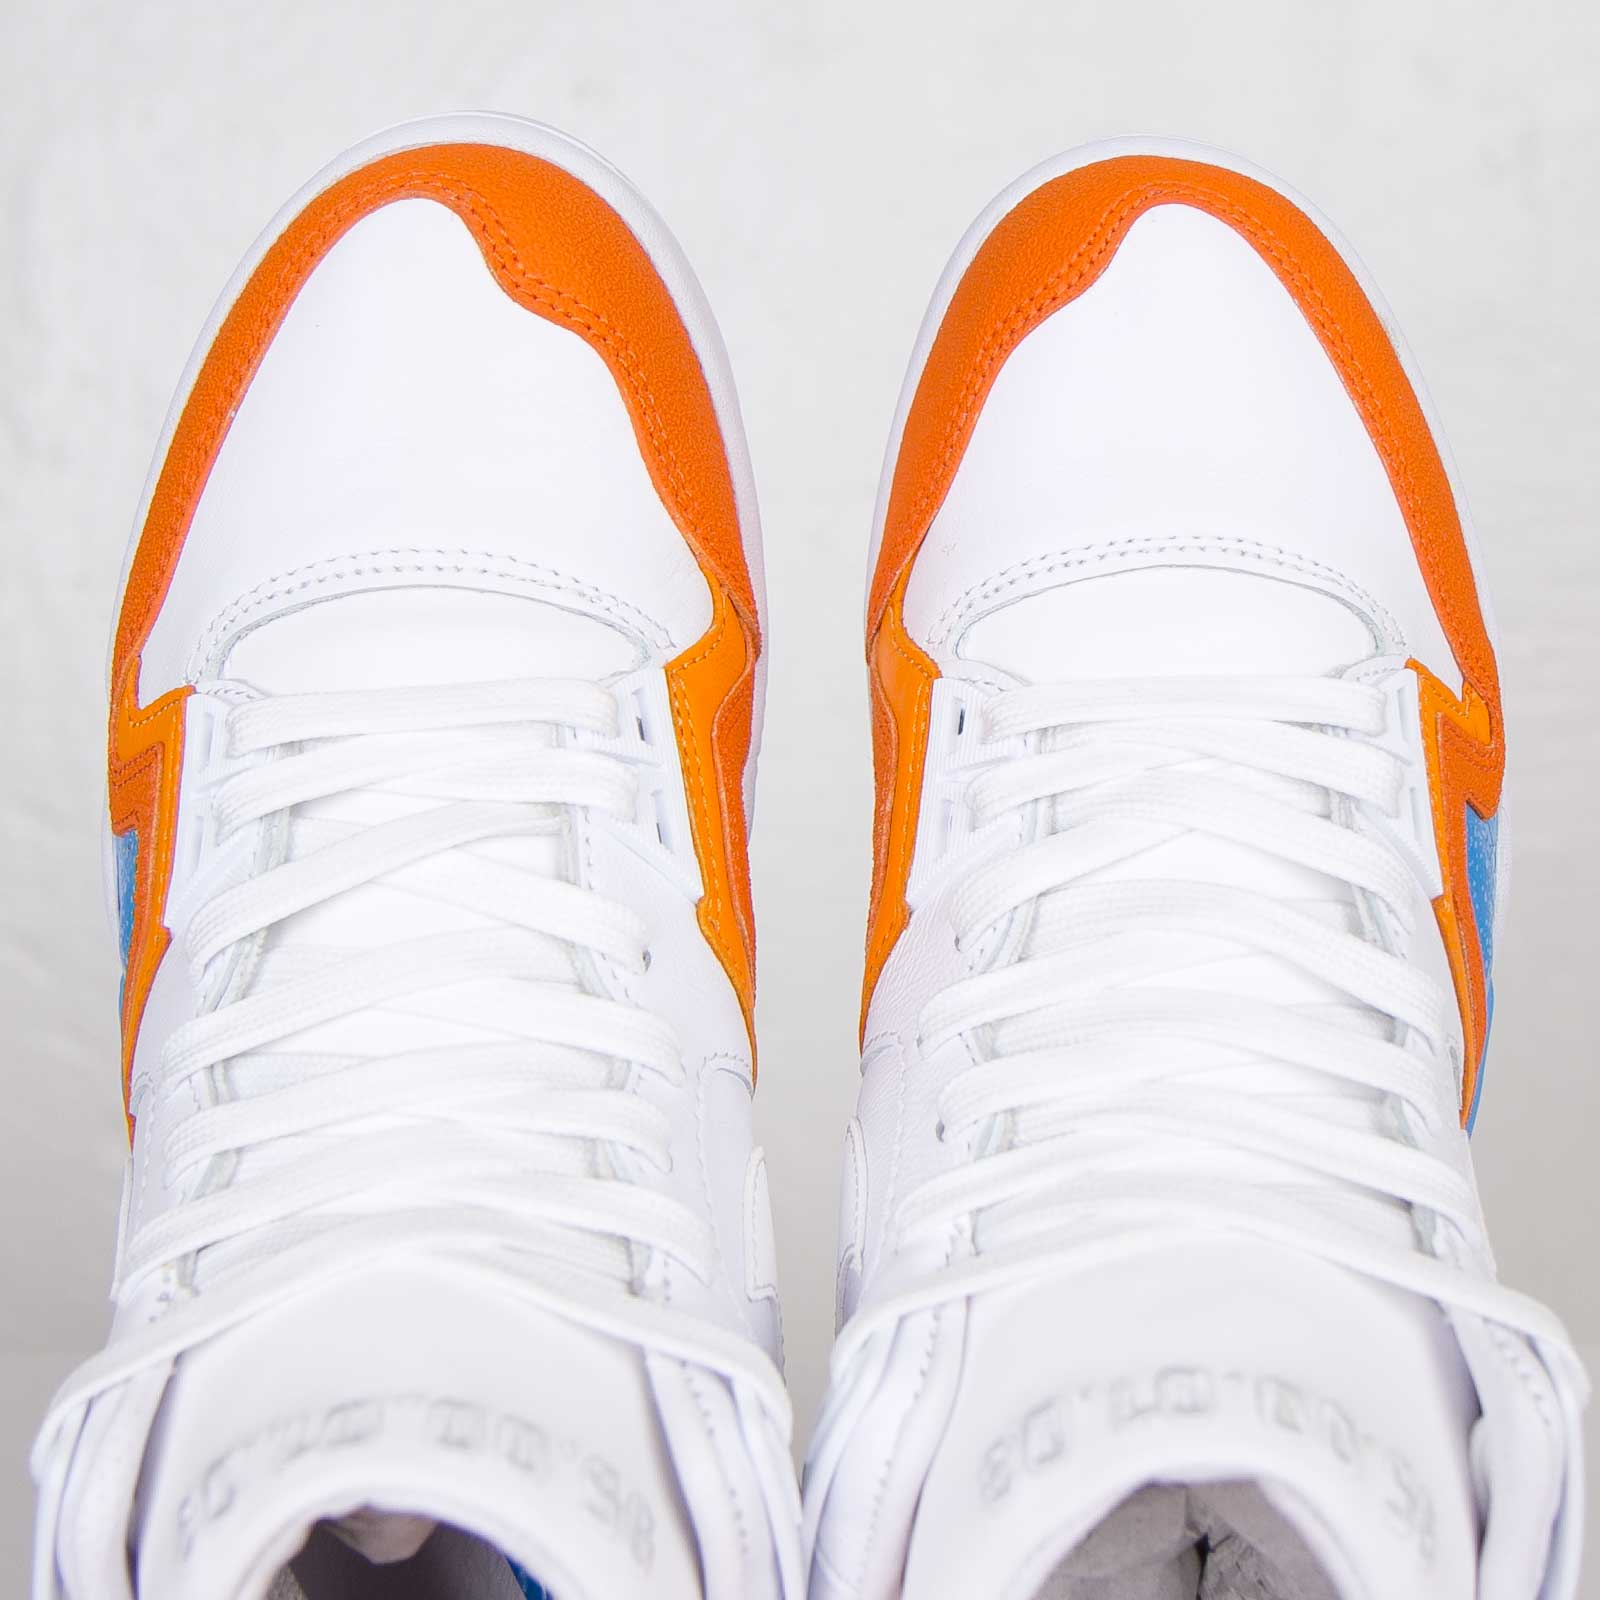 Nike Air Tech Challenge II SP - 621358-100 - Sneakersnstuff ... 1f7788a55d